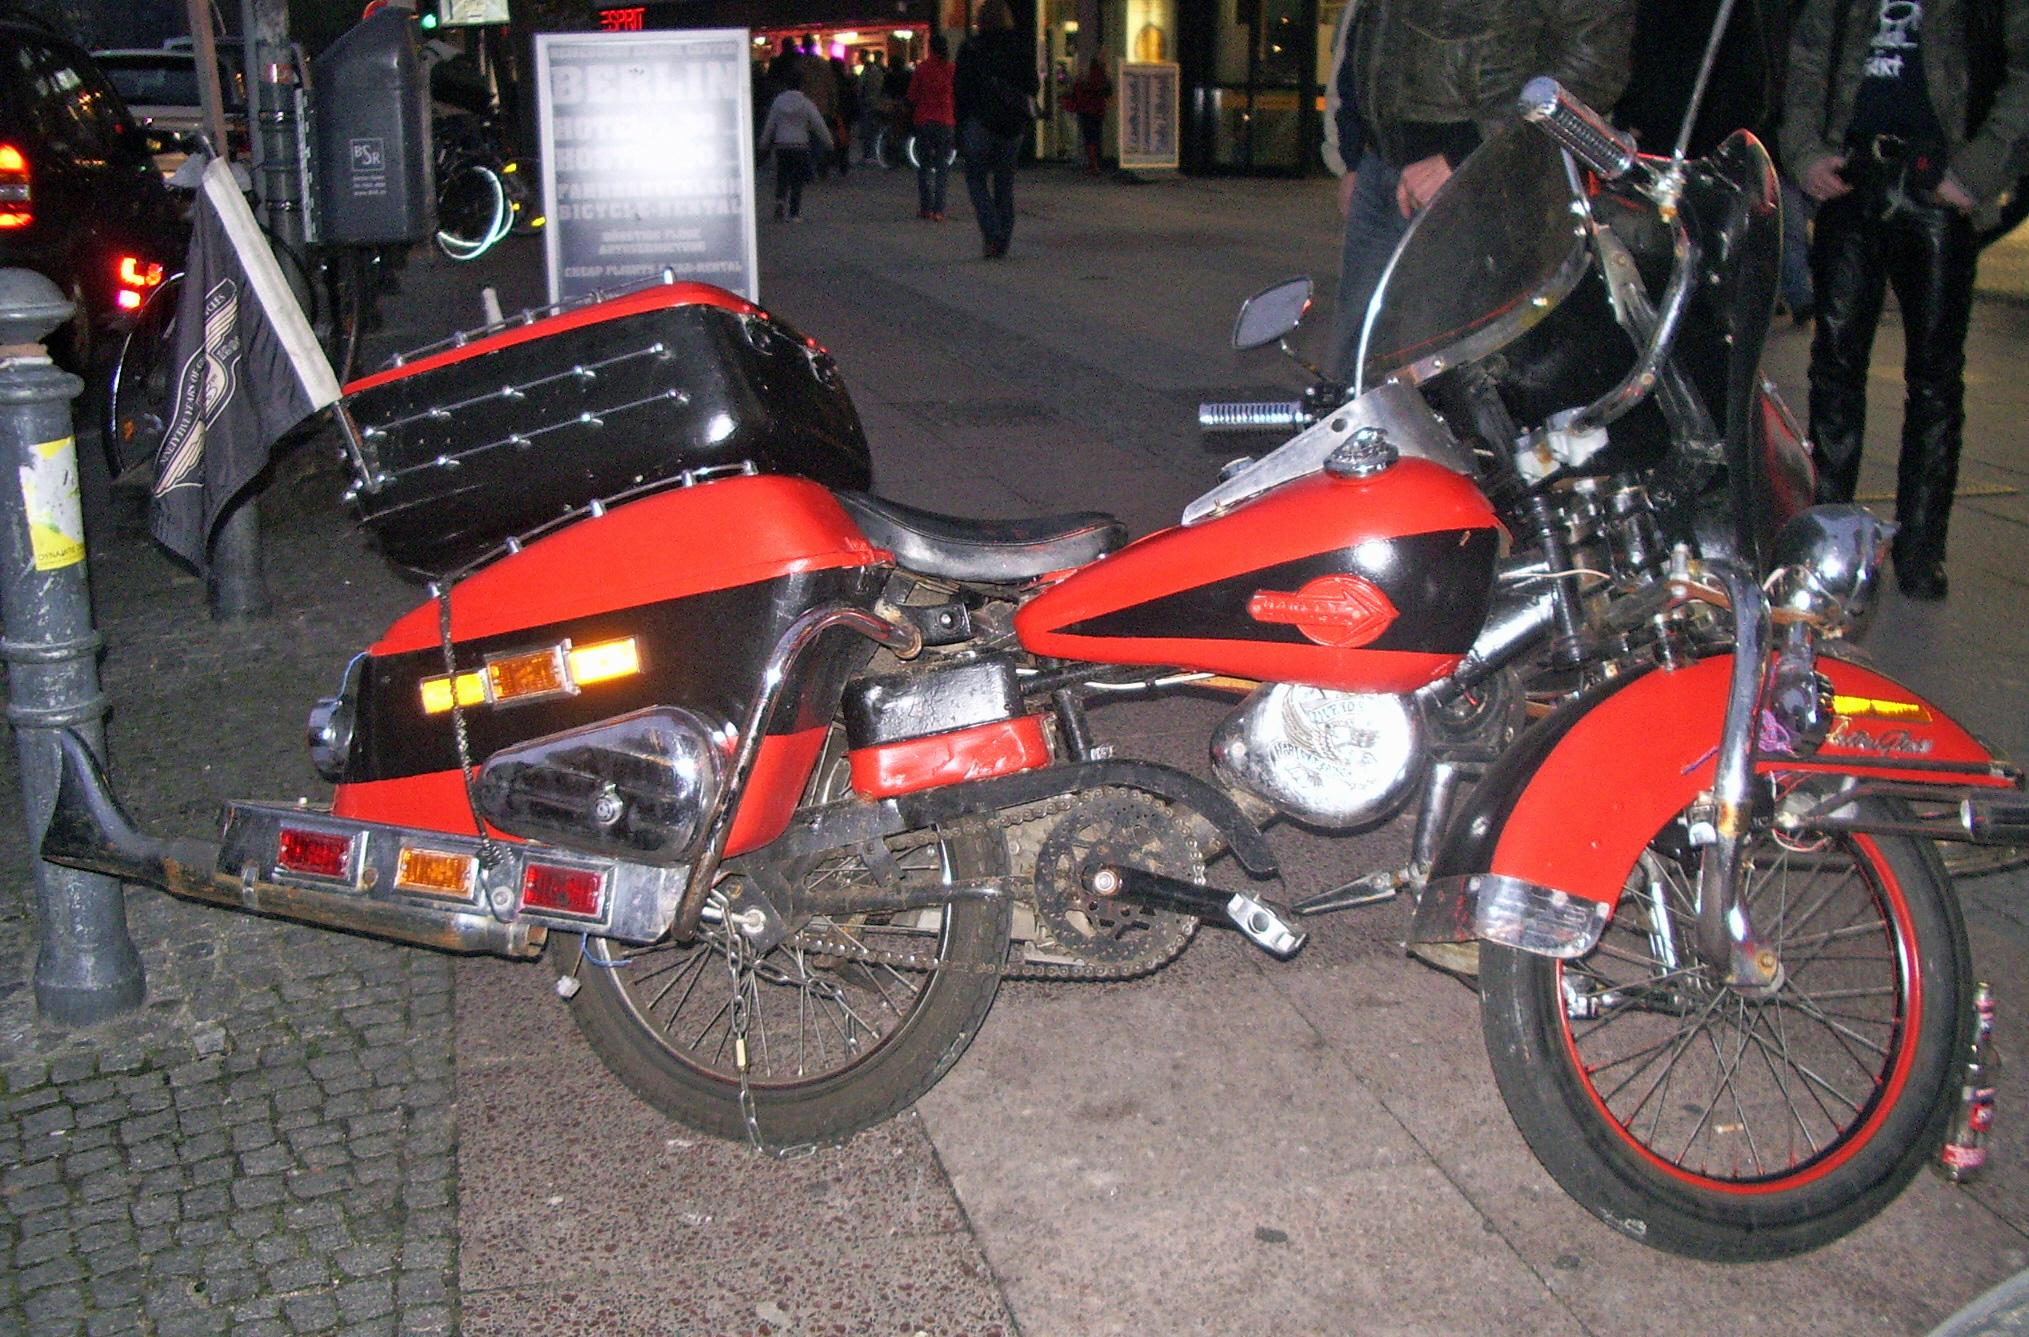 Harley Fahrrad